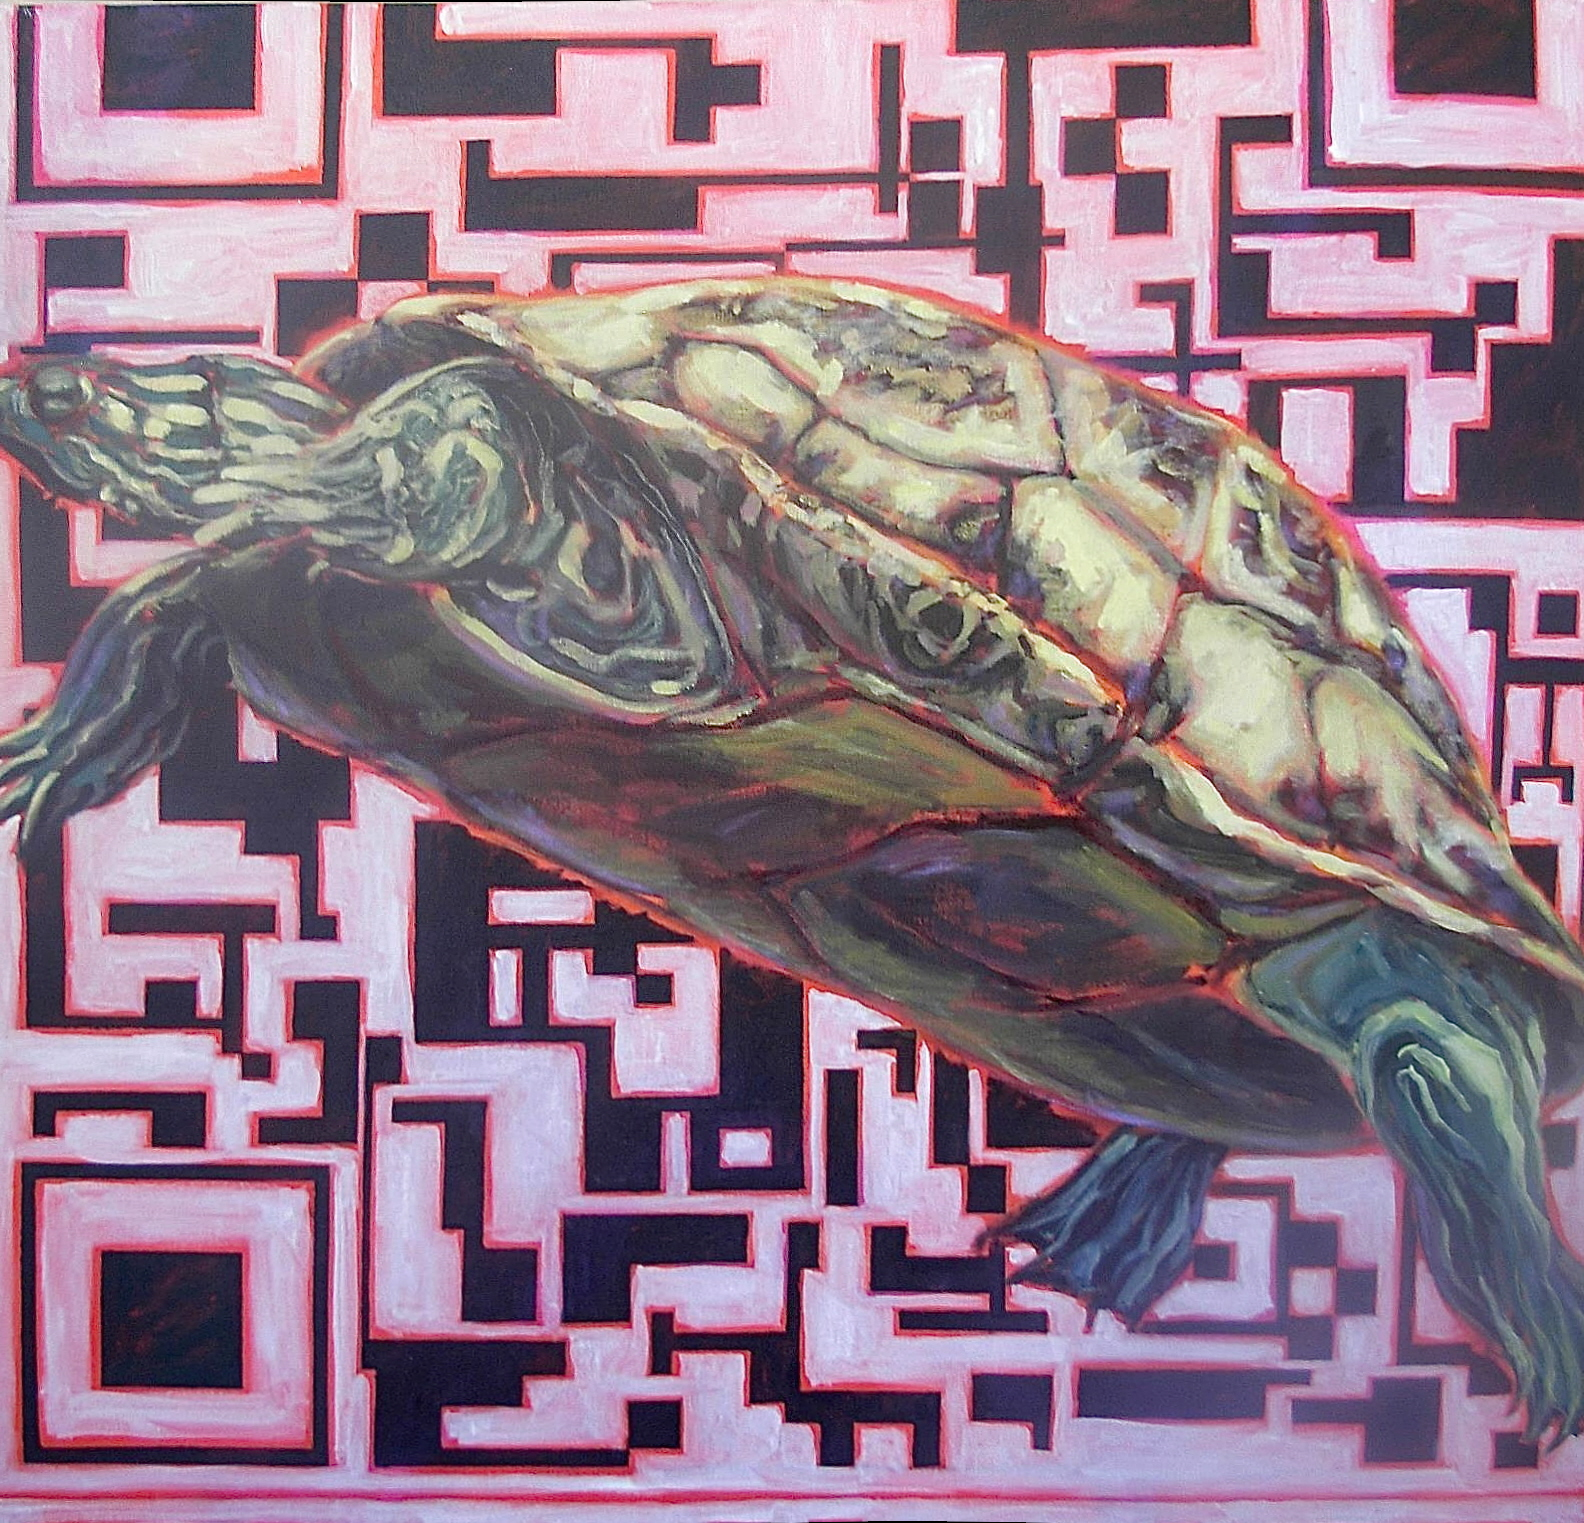 Nature/QR Code II (Turtle)